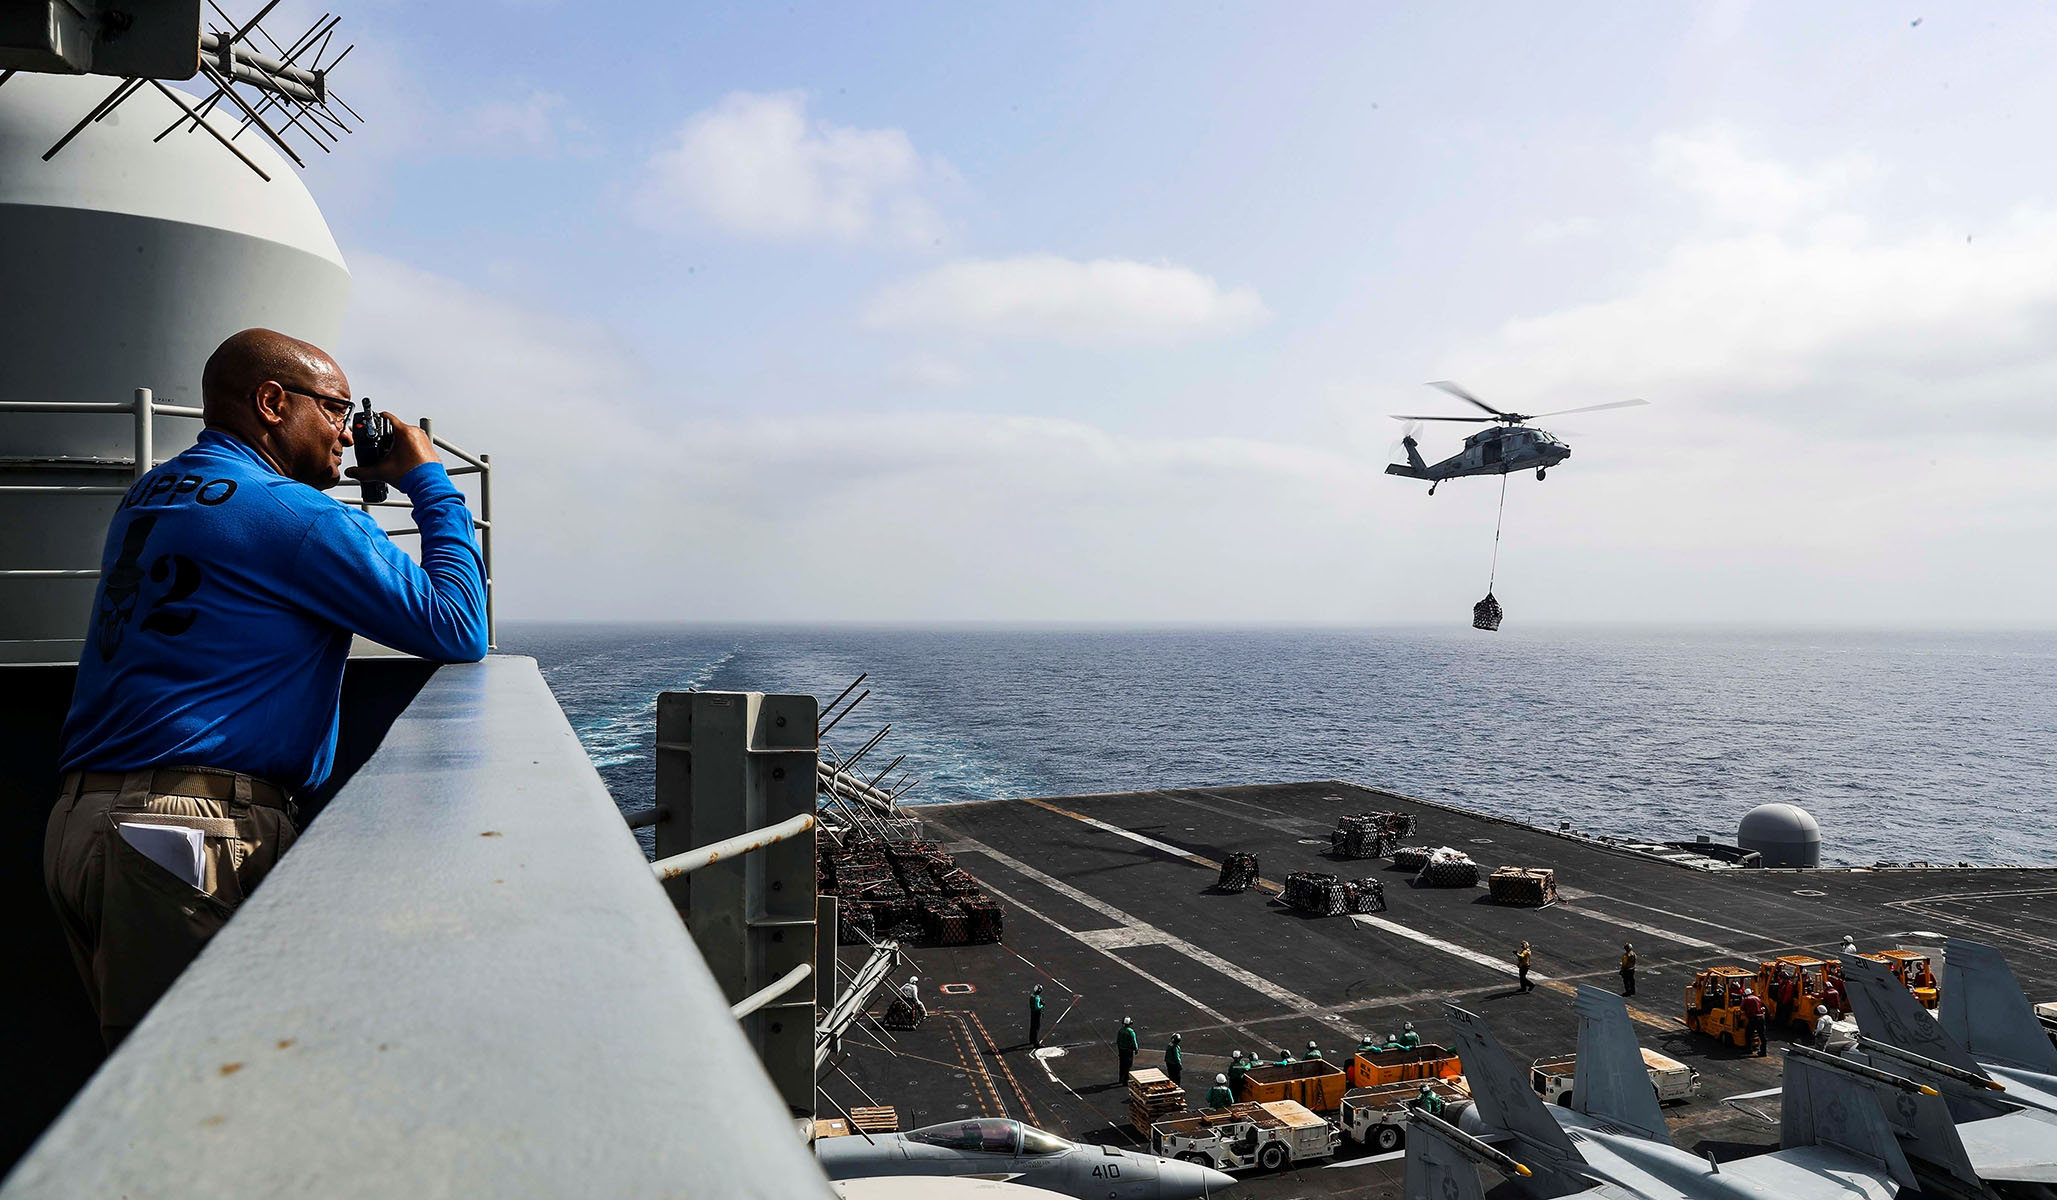 Navy Grounds Saudi Flight Students amid Investigation into Pensacola Shooting